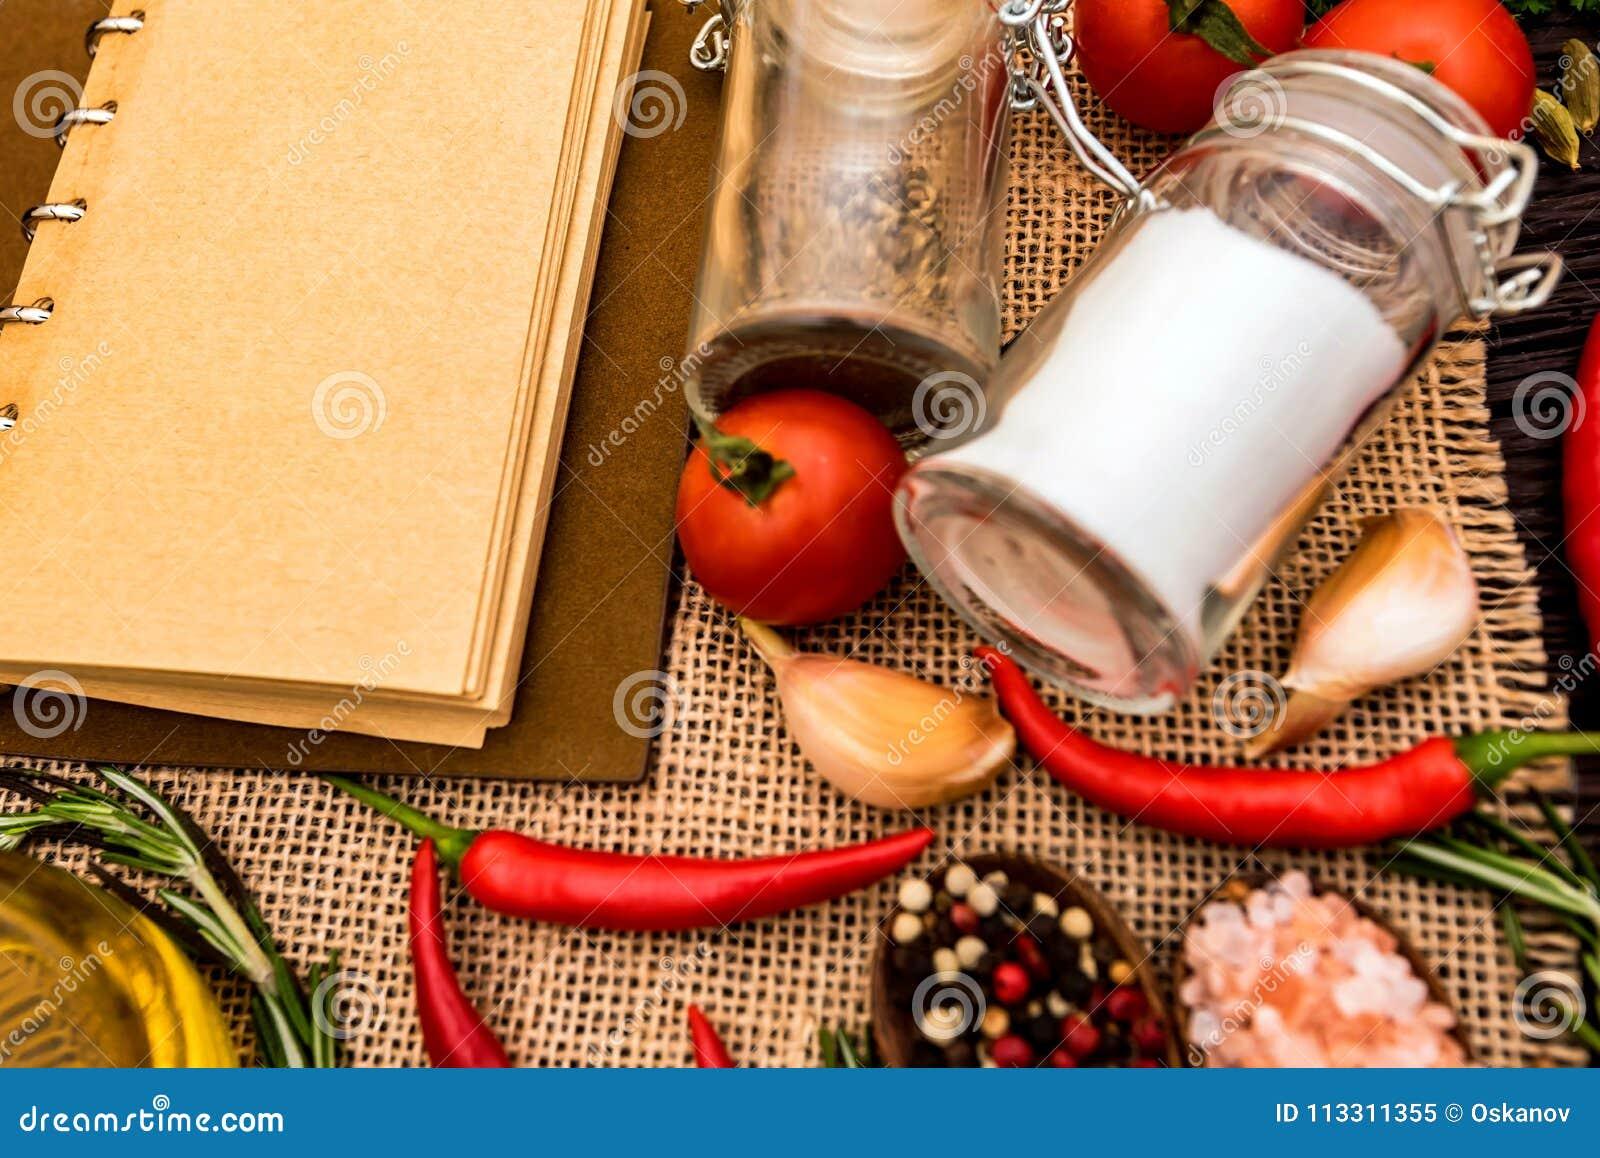 salt pepper a spice of life novel